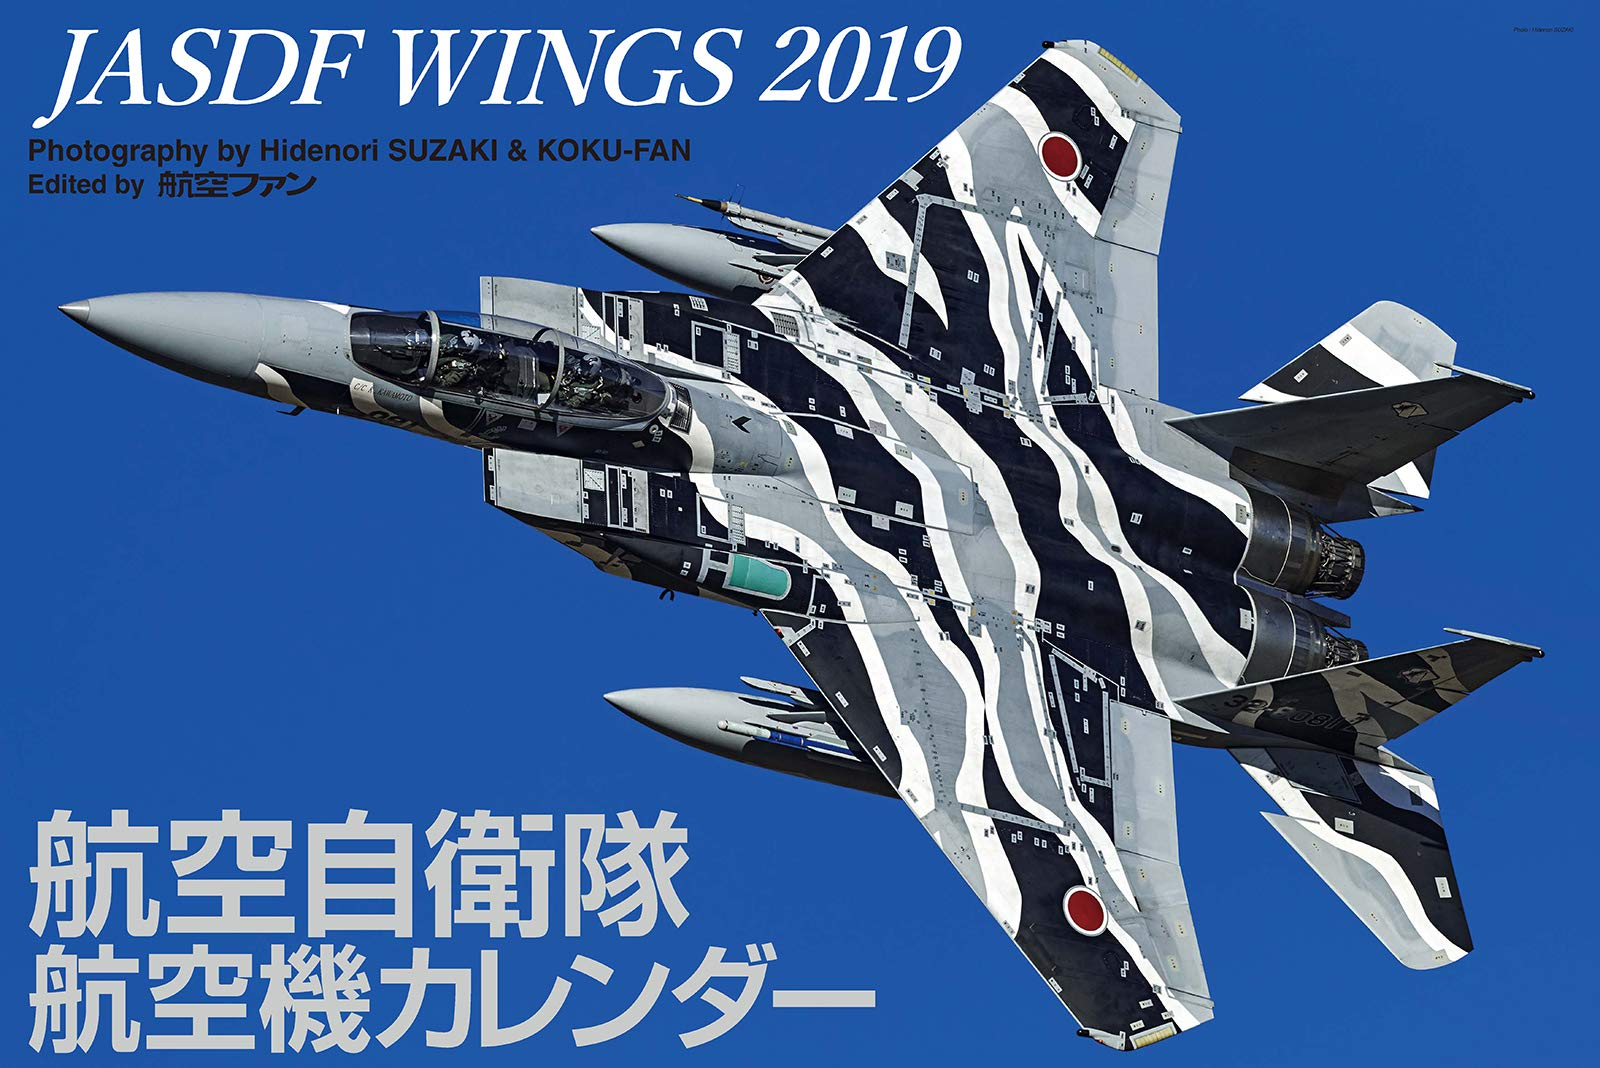 Amazon.co.jp: 航空自衛隊航空機カレンダー2019 ([カレンダー]): 本